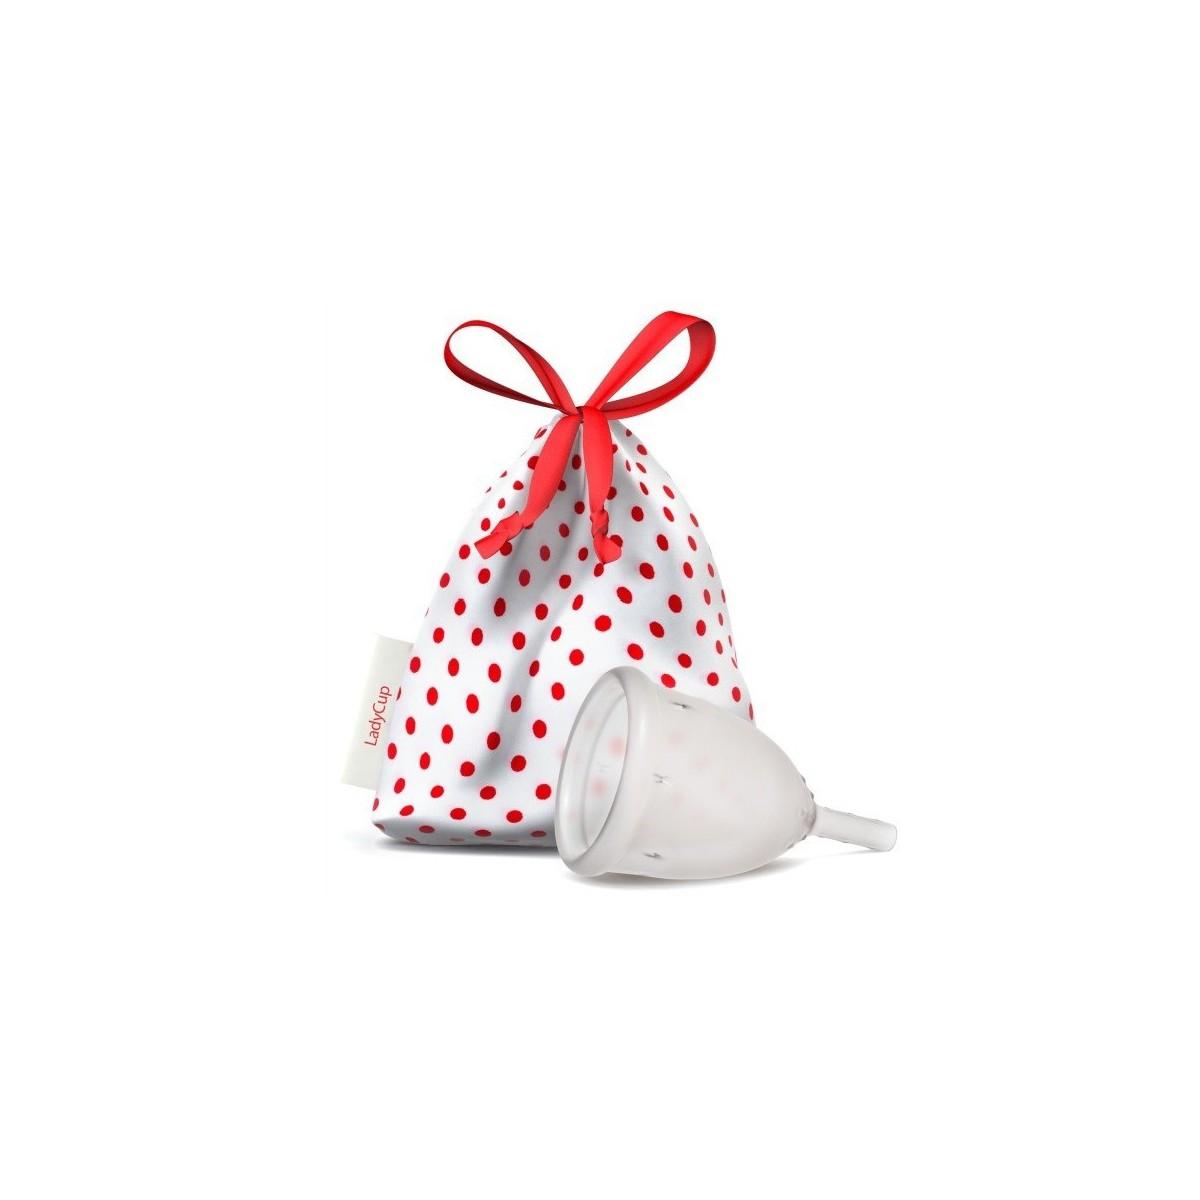 Coupe menstruelle ladycup sebio - Coupe menstruelle ladycup ...